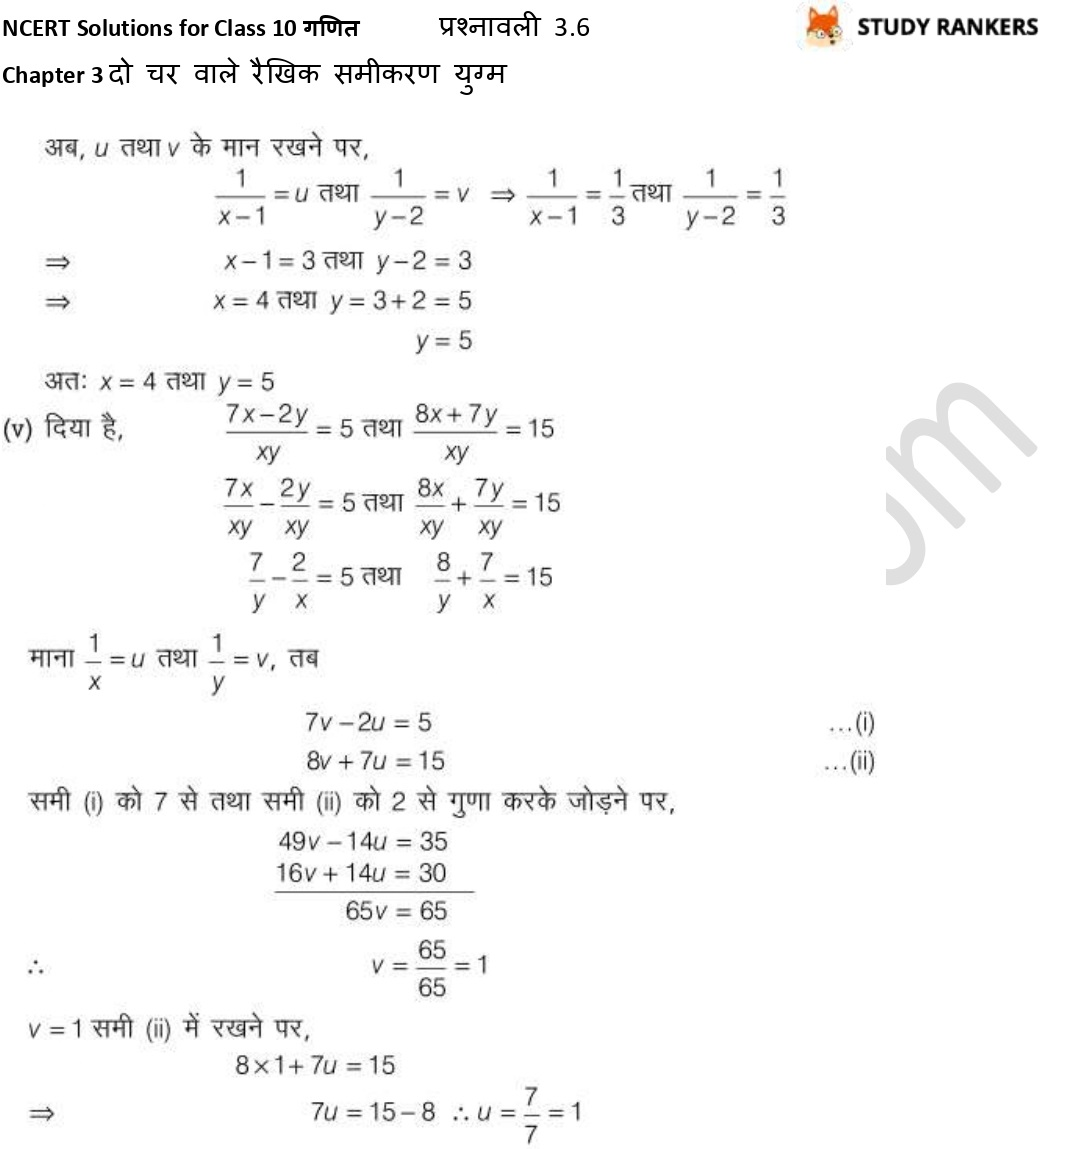 NCERT Solutions for Class 10 Maths Chapter 3 दो चर वाले रैखिक समीकरण युग्म प्रश्नावली 3.6 Part 6